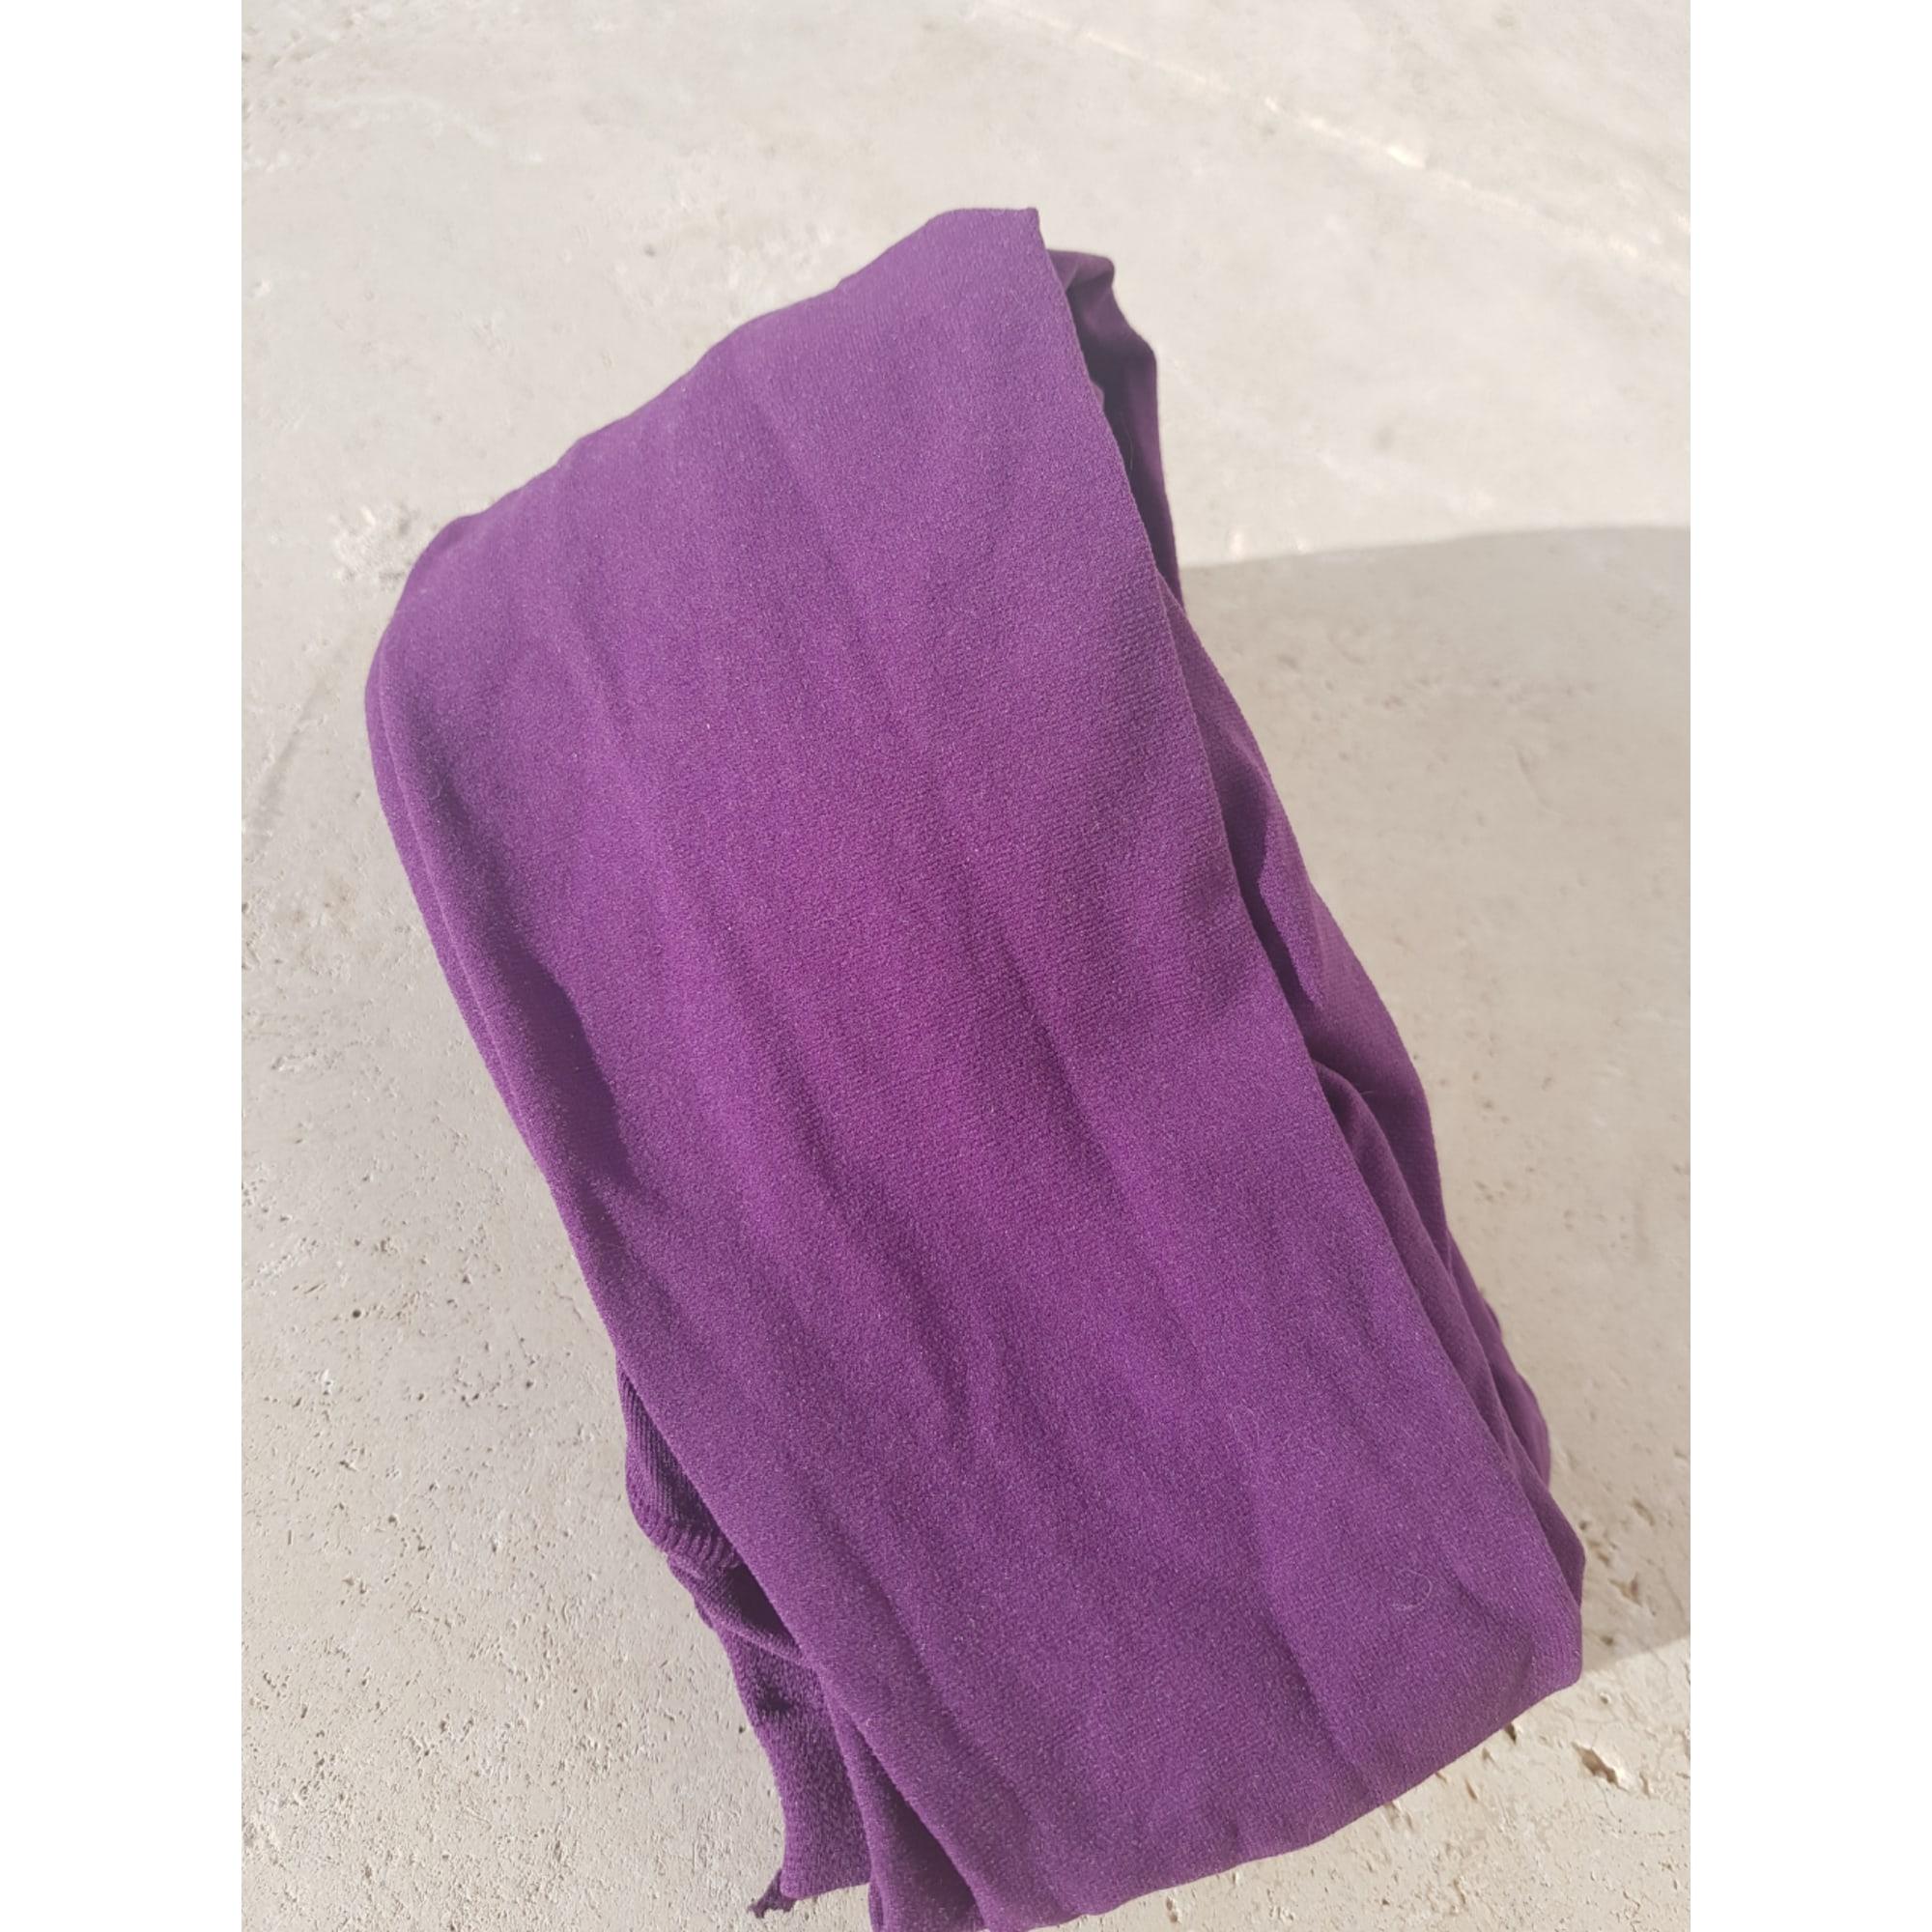 Collant CALZEDONIA Violet, mauve, lavande